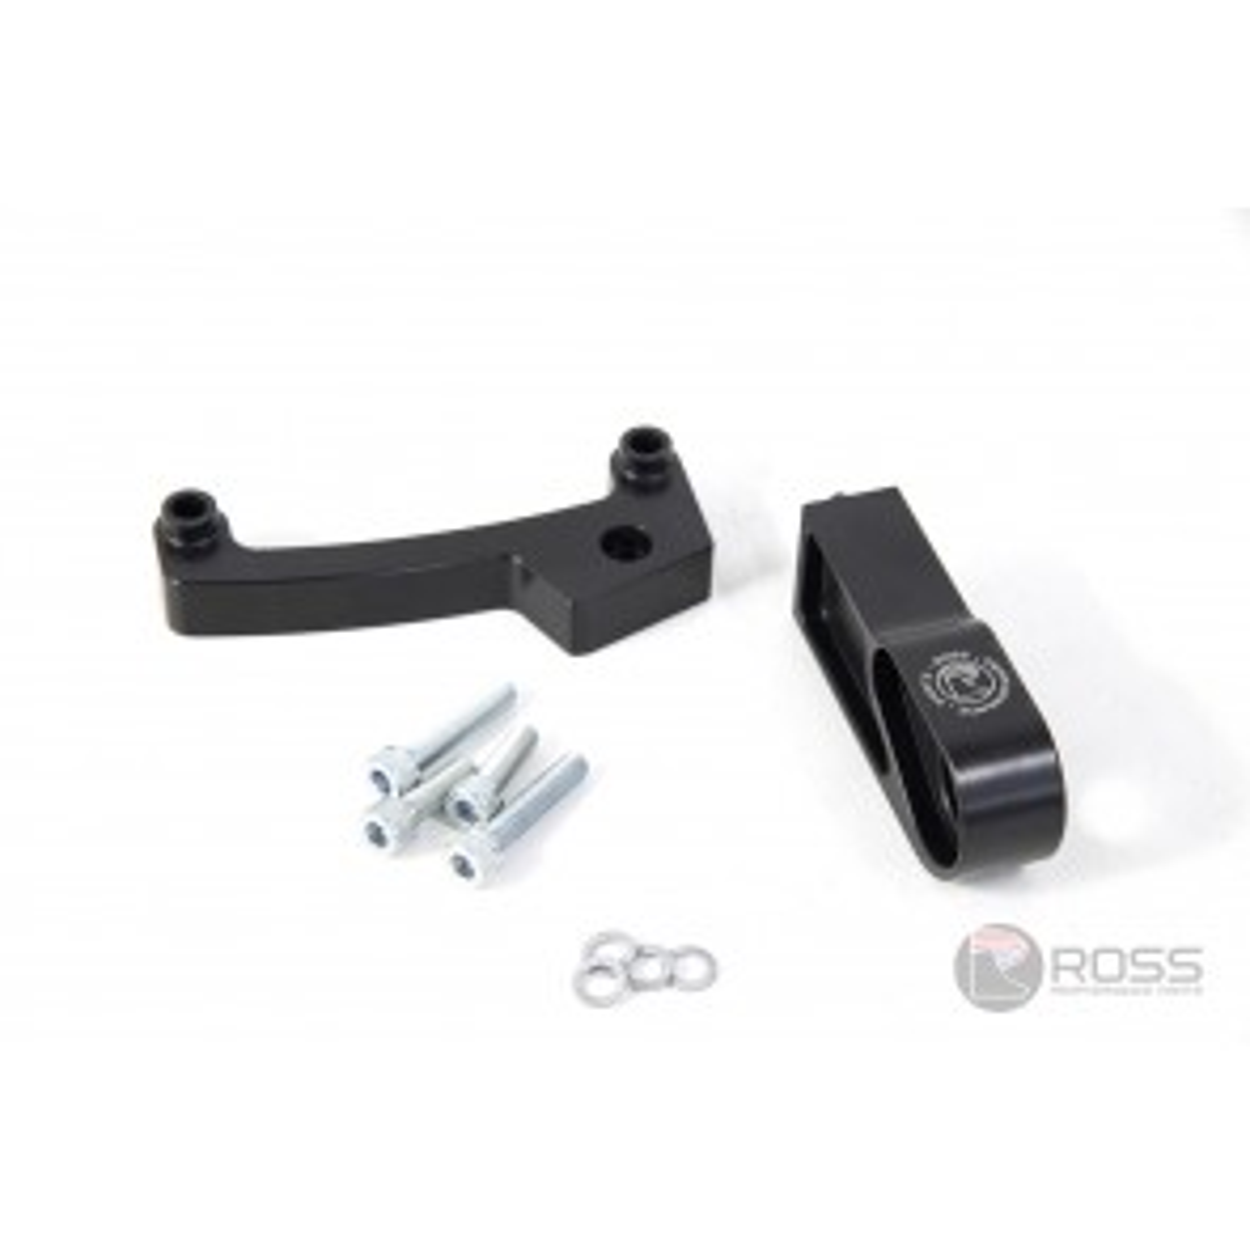 Ross Sport Crank Angle Sensor Mount Nissan Silvia S14 200SX / S15 SR20DET